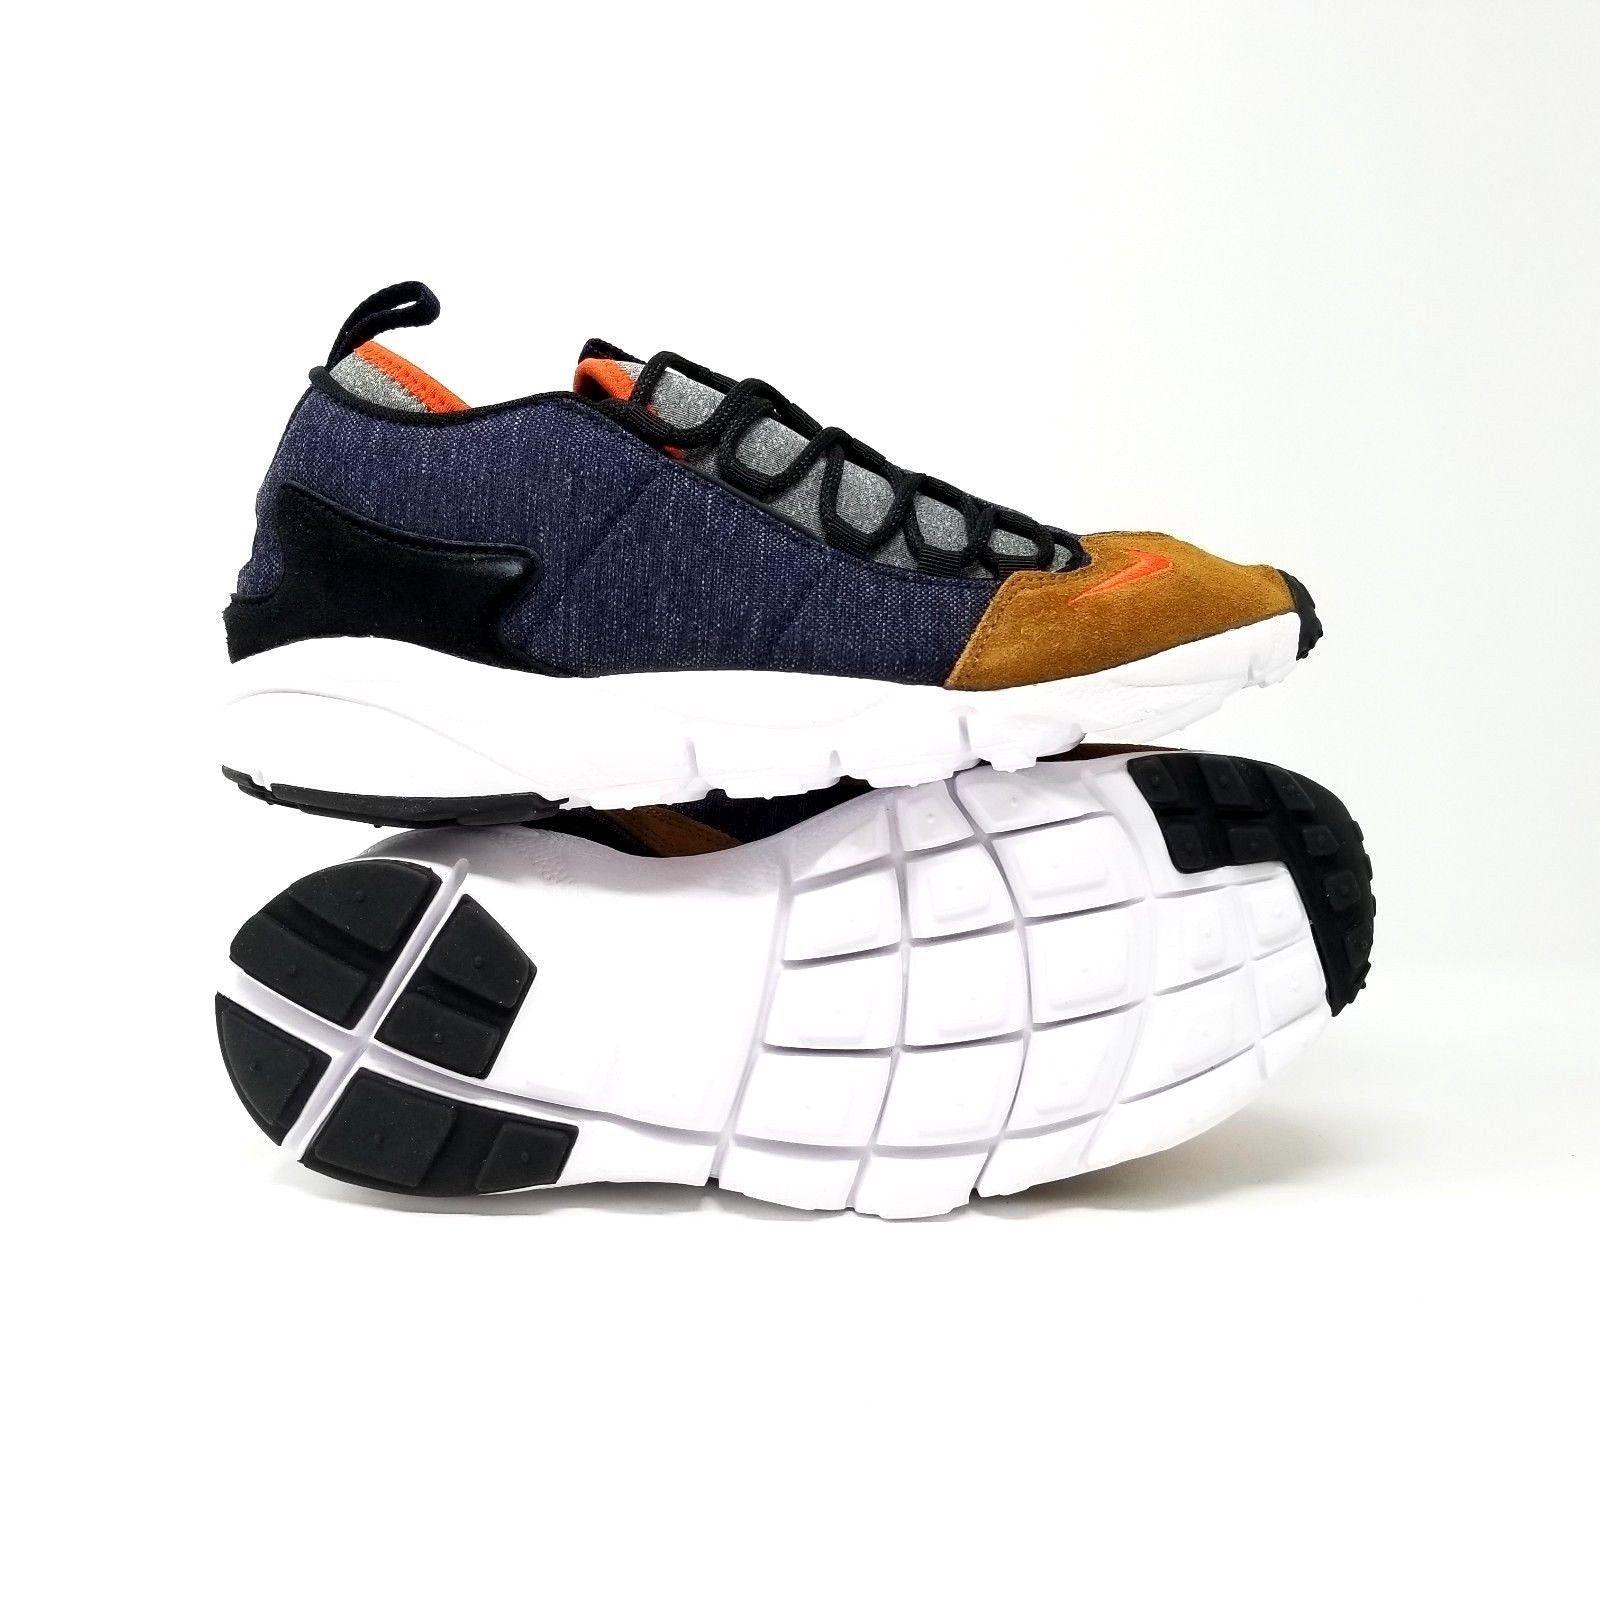 Nike Air Footscape NM Mens Running Shoes Obsidian Team Orange 852629-401